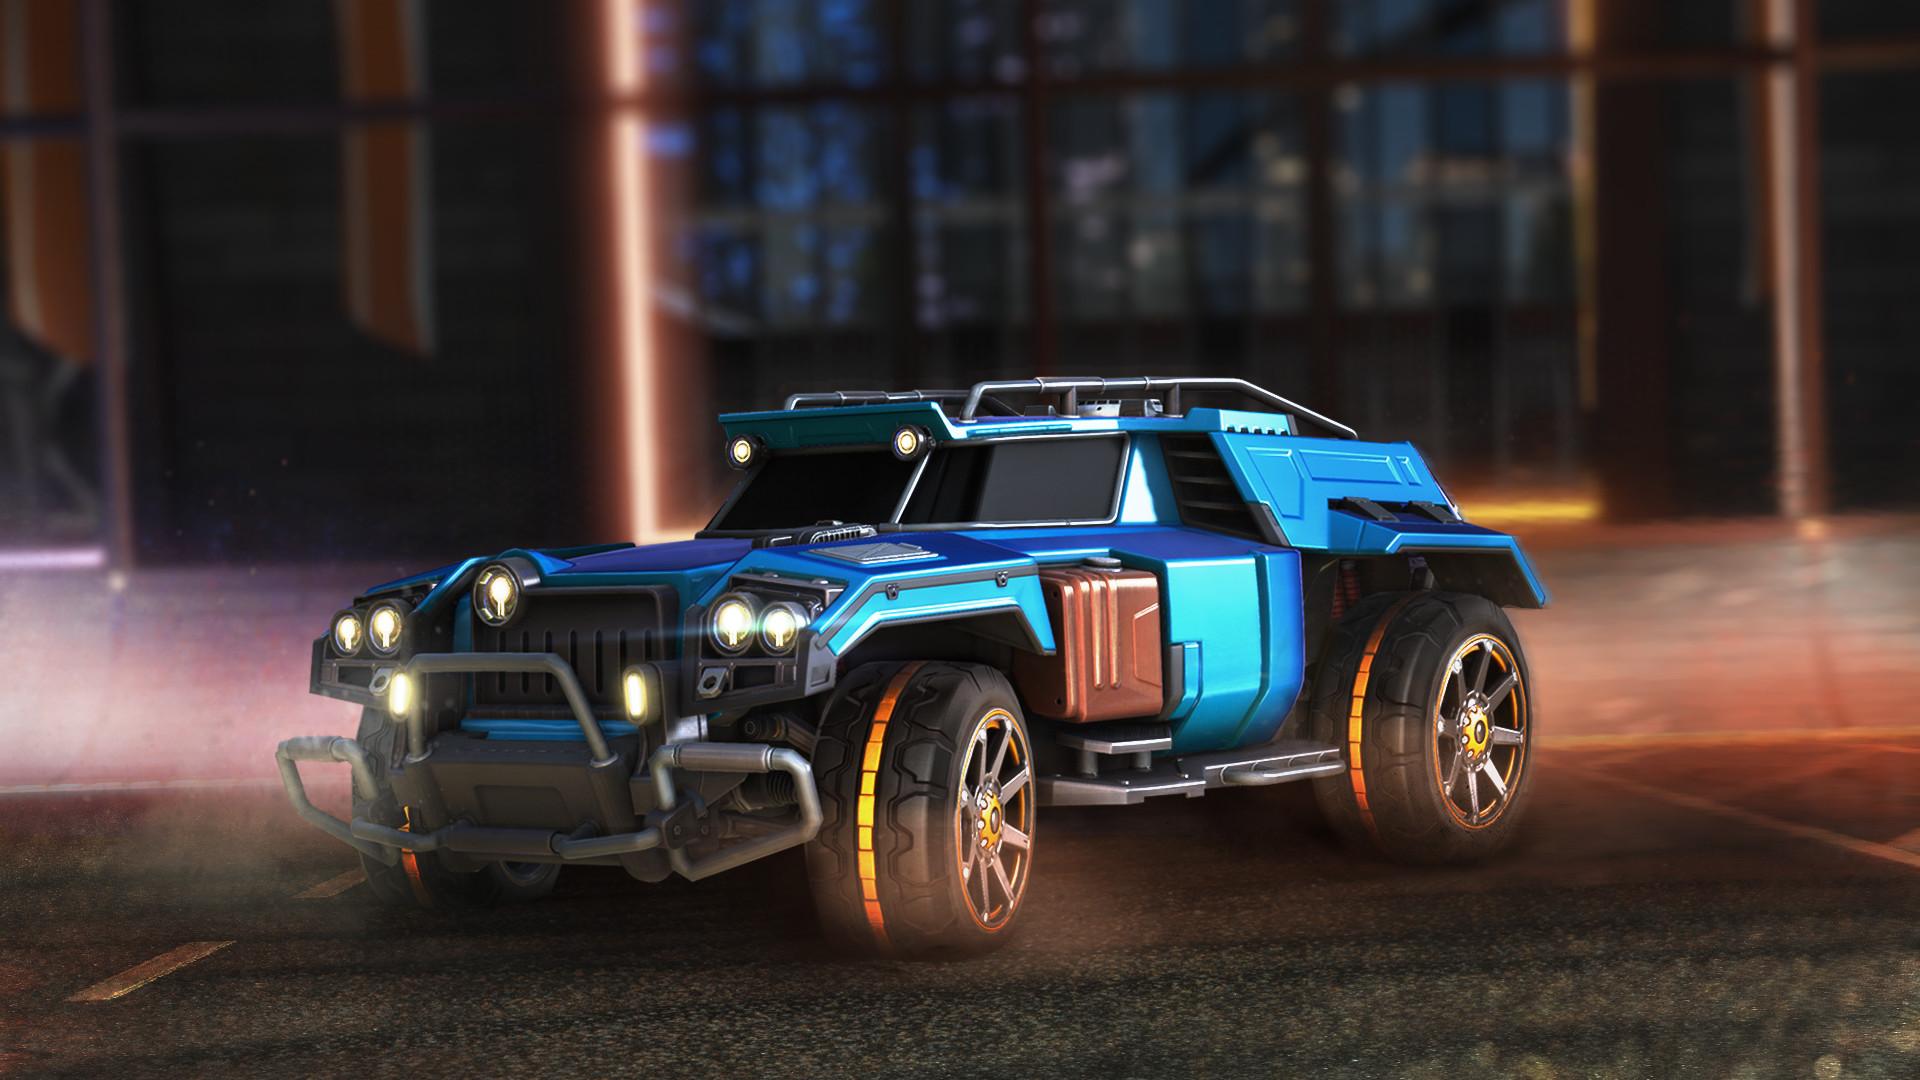 New Rocket League Cars